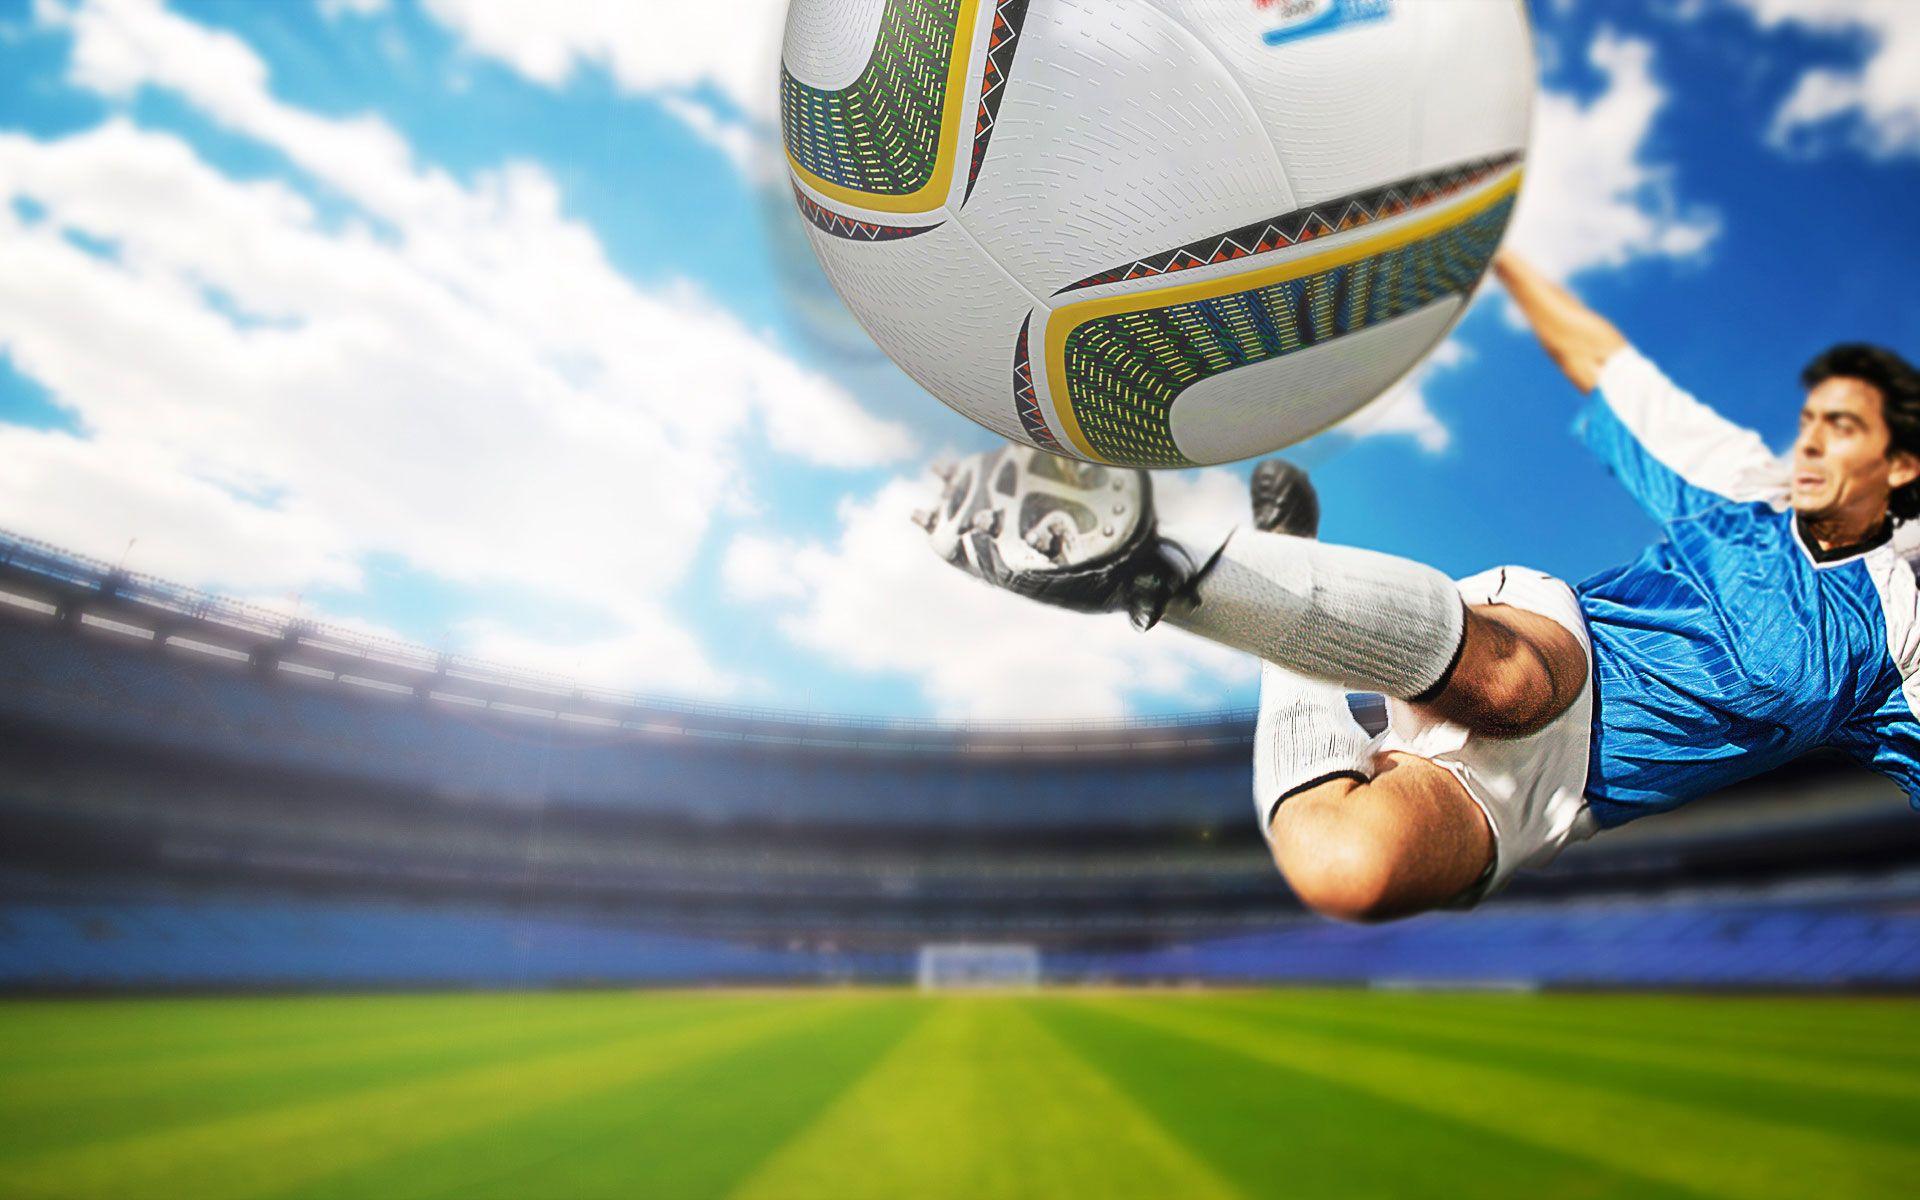 Sports HD Wallpapers Free Wallpaper Downloads Sports HD